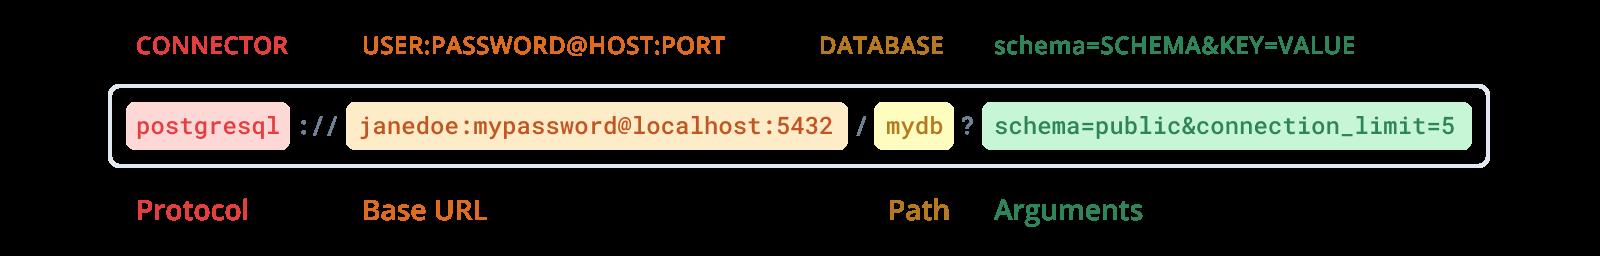 Database URL breakdown